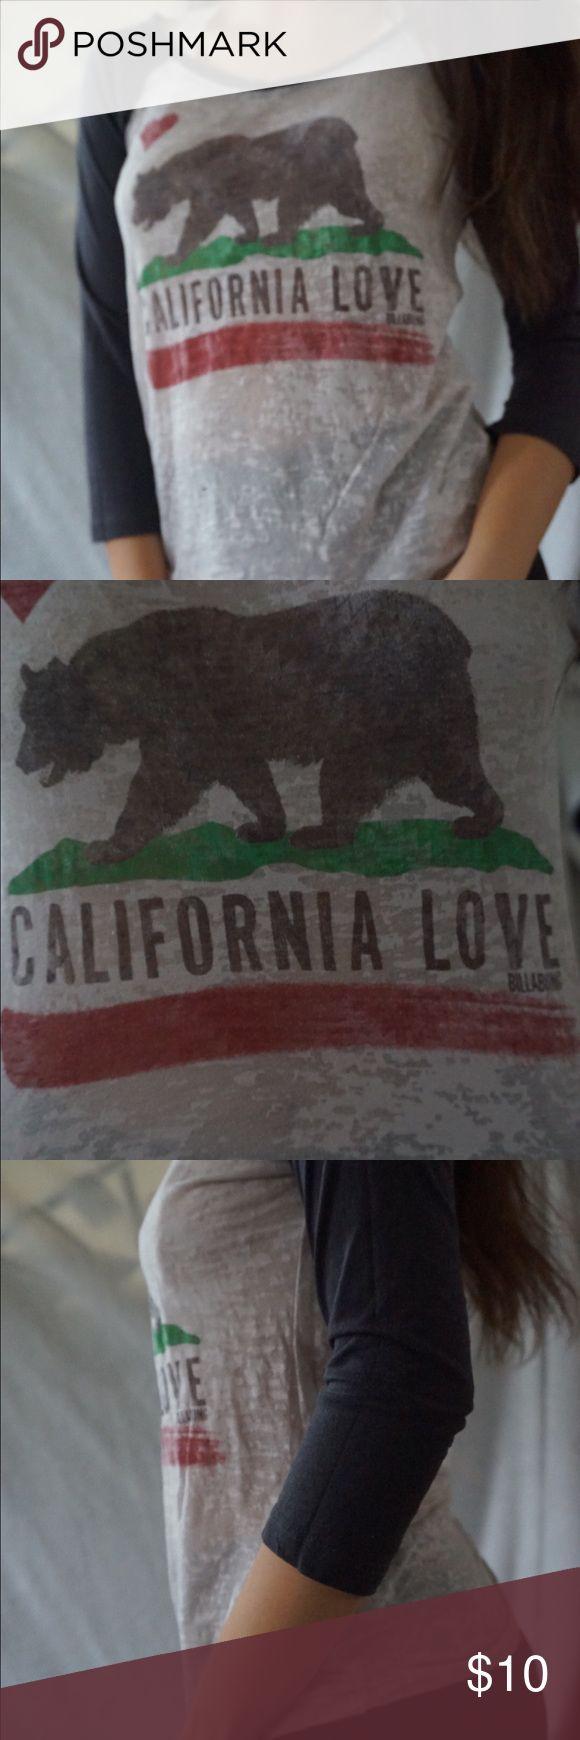 Billabong California flag baseball t-shirt Thin see through material, with a print of the California flag. Baseball T style Billabong Tops Tees - Long Sleeve